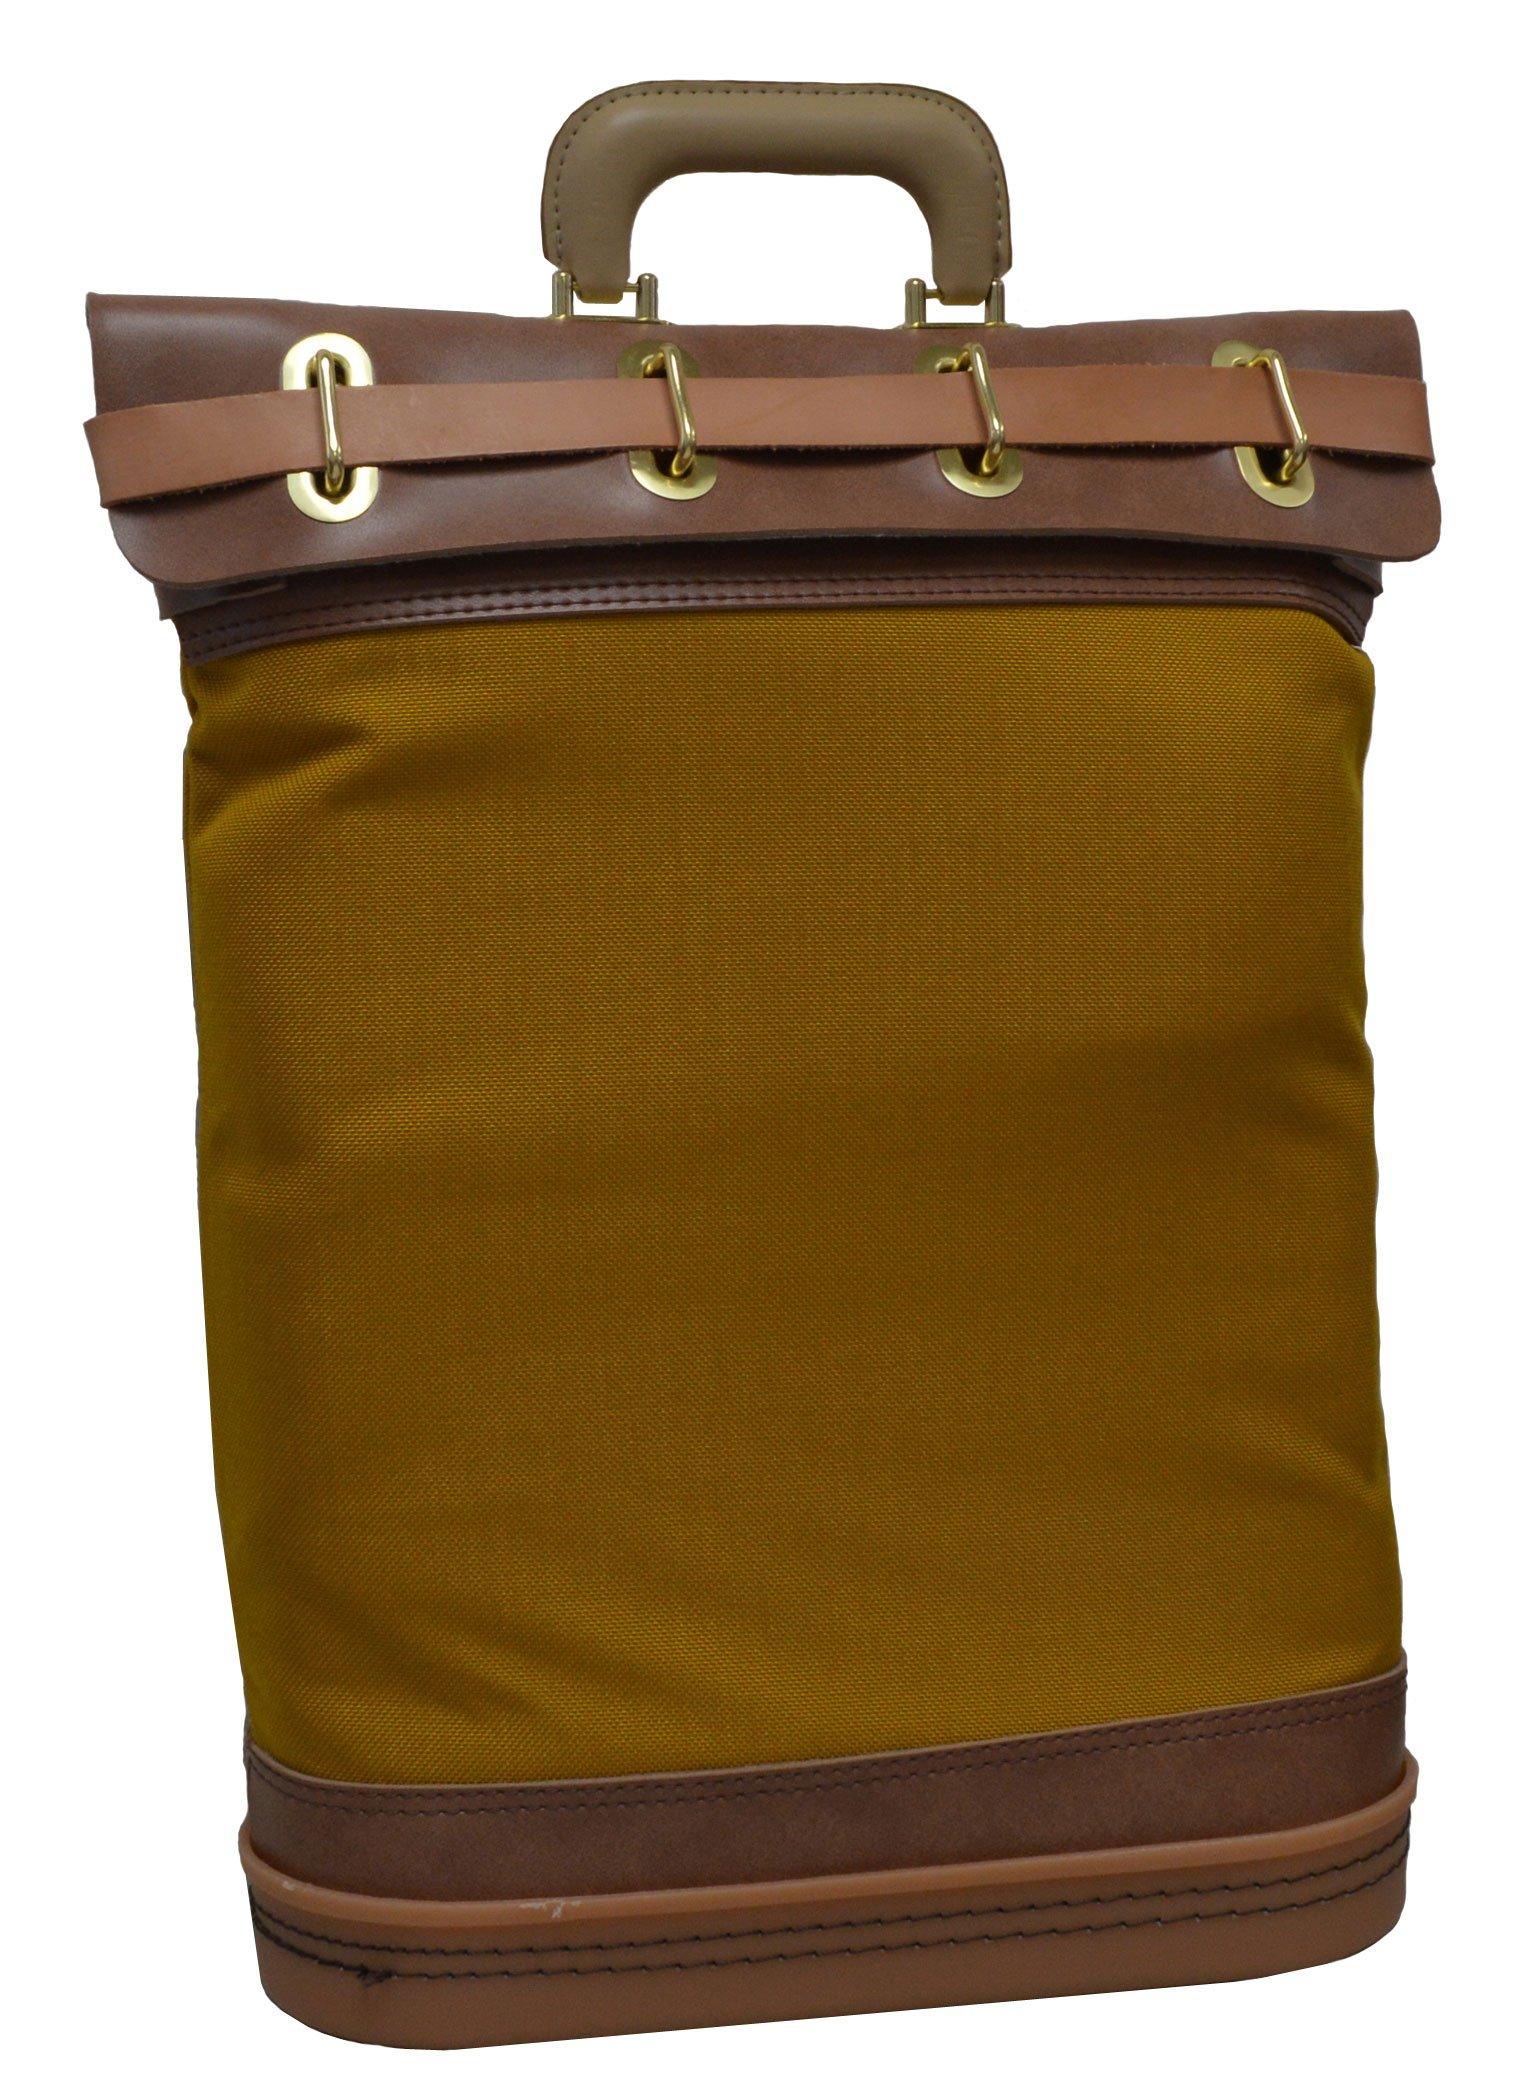 Security Regulation Mail Bag 1350 Denier Ballistic Weave Nylon Gold